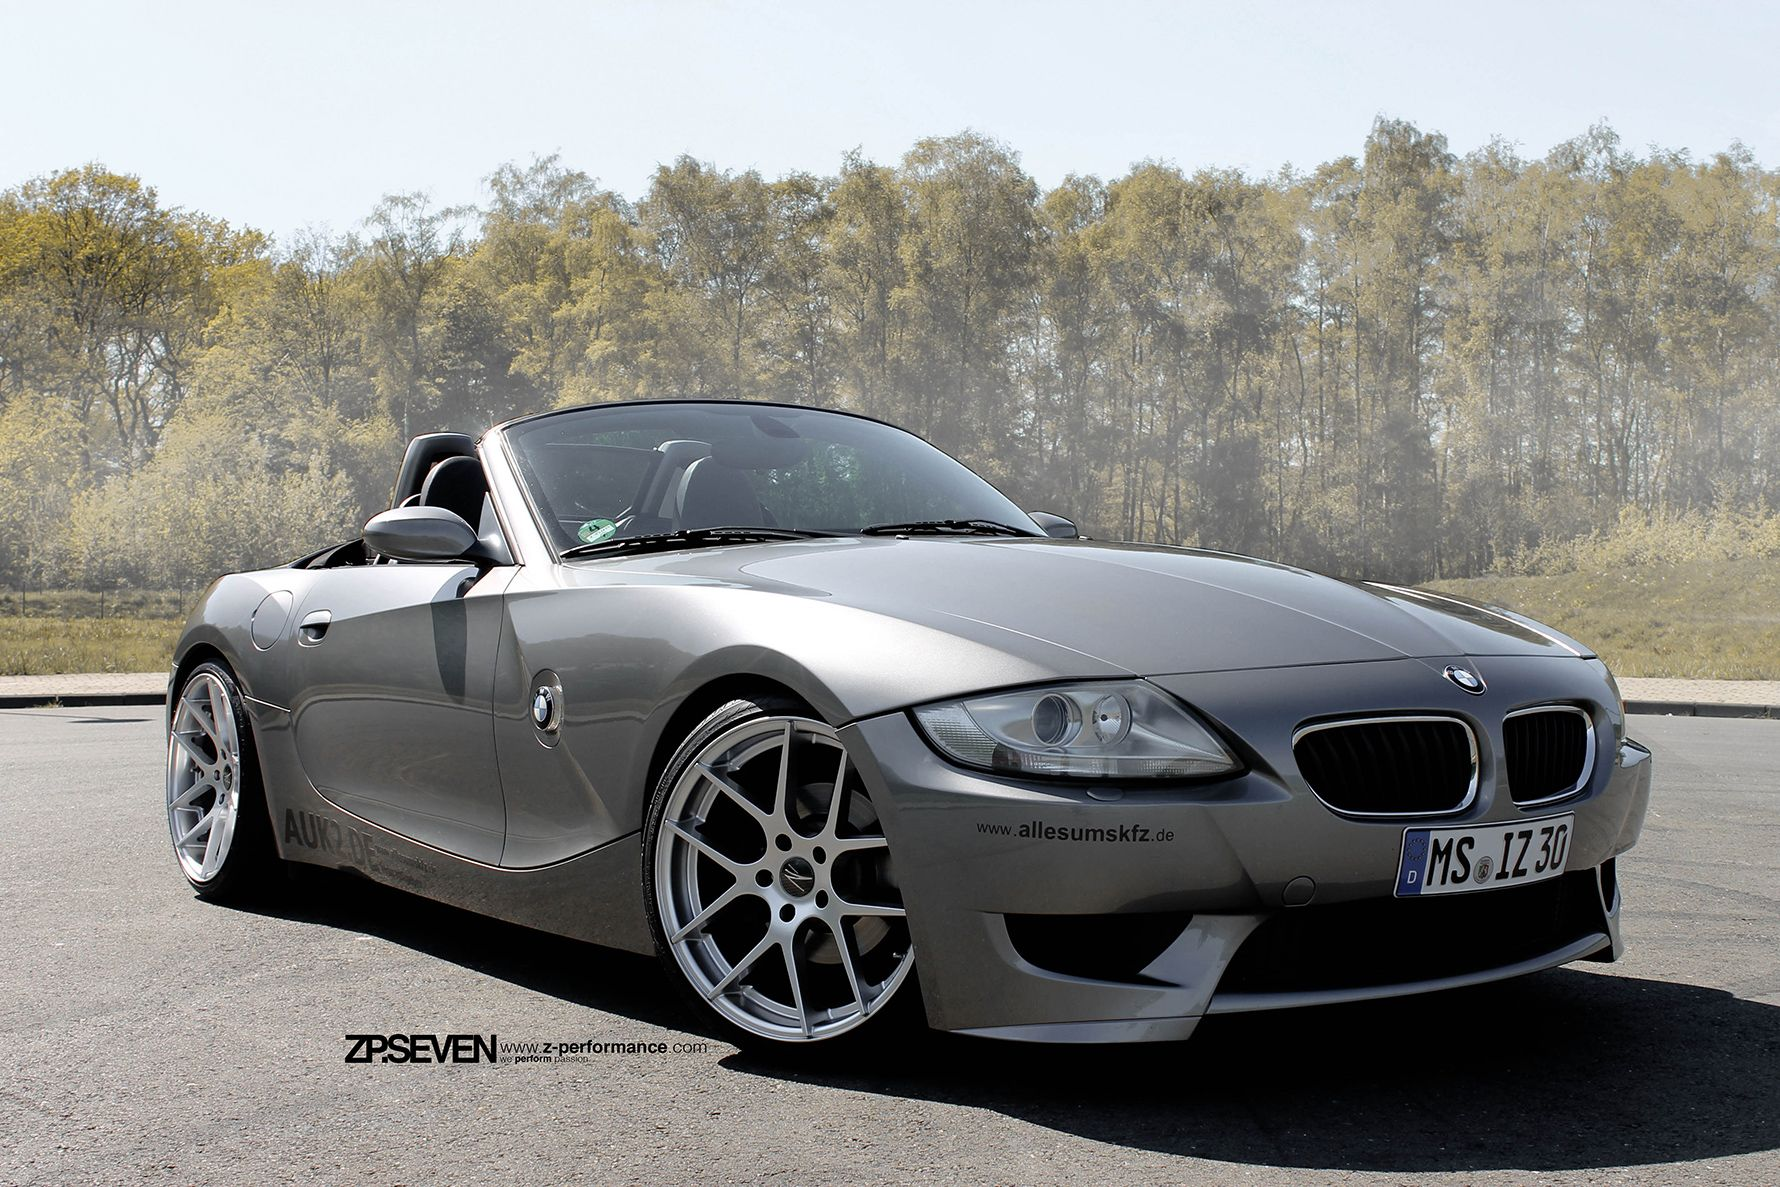 hight resolution of z performance zroadster com bmw z1 z2 z3 z4 z8 m mini roadster coupe